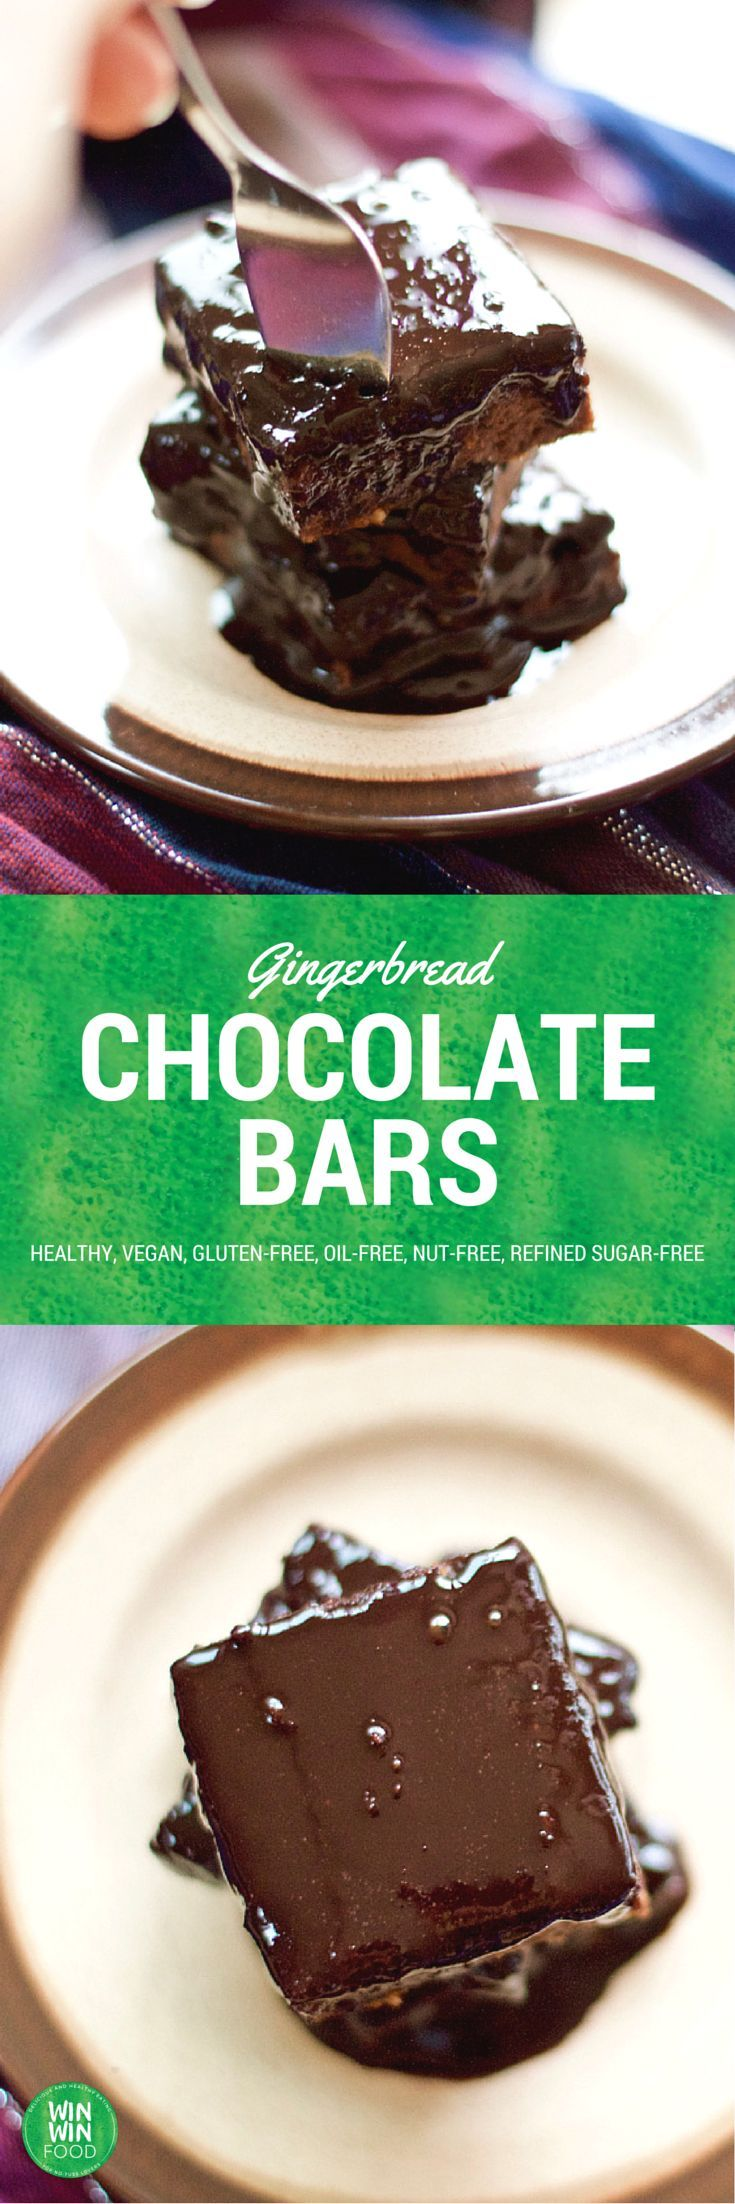 Gingerbread Chocolate Bars | WIN-WINFOOD.com #healthy #vegan #glutenfree